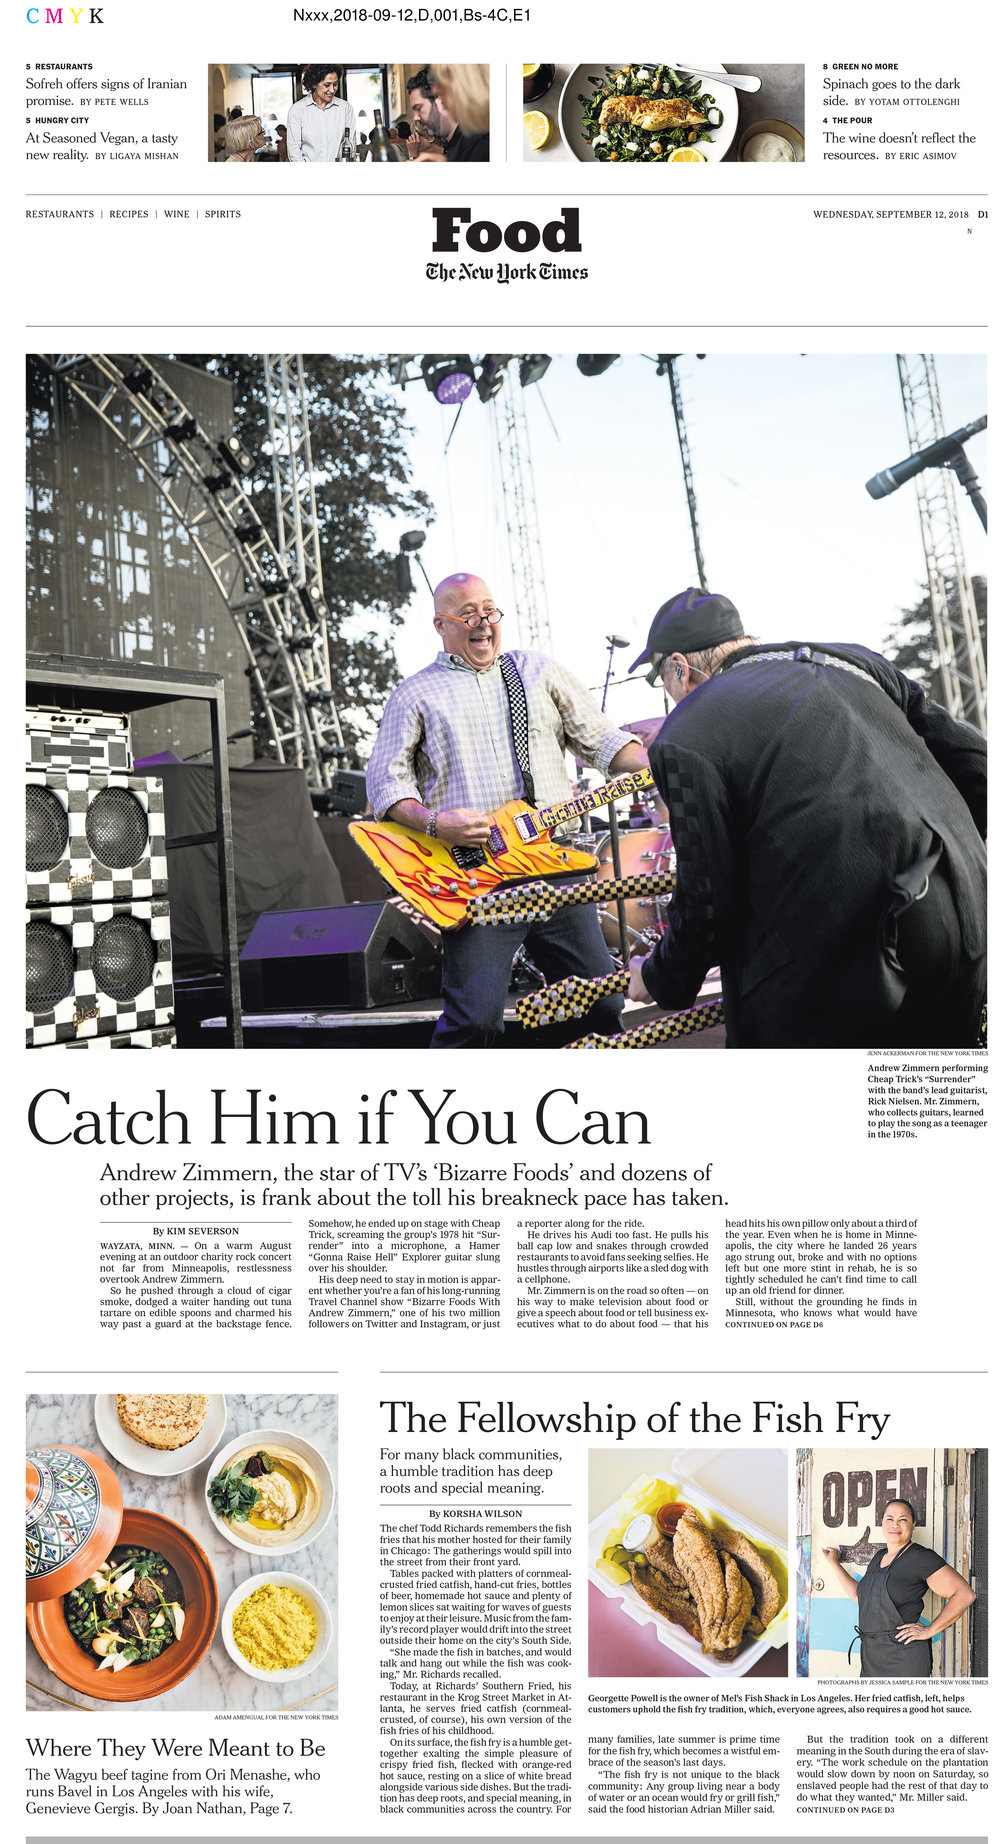 NYT#NYTimes#09-12-2018#NewYork#1#DinDress#1#cci